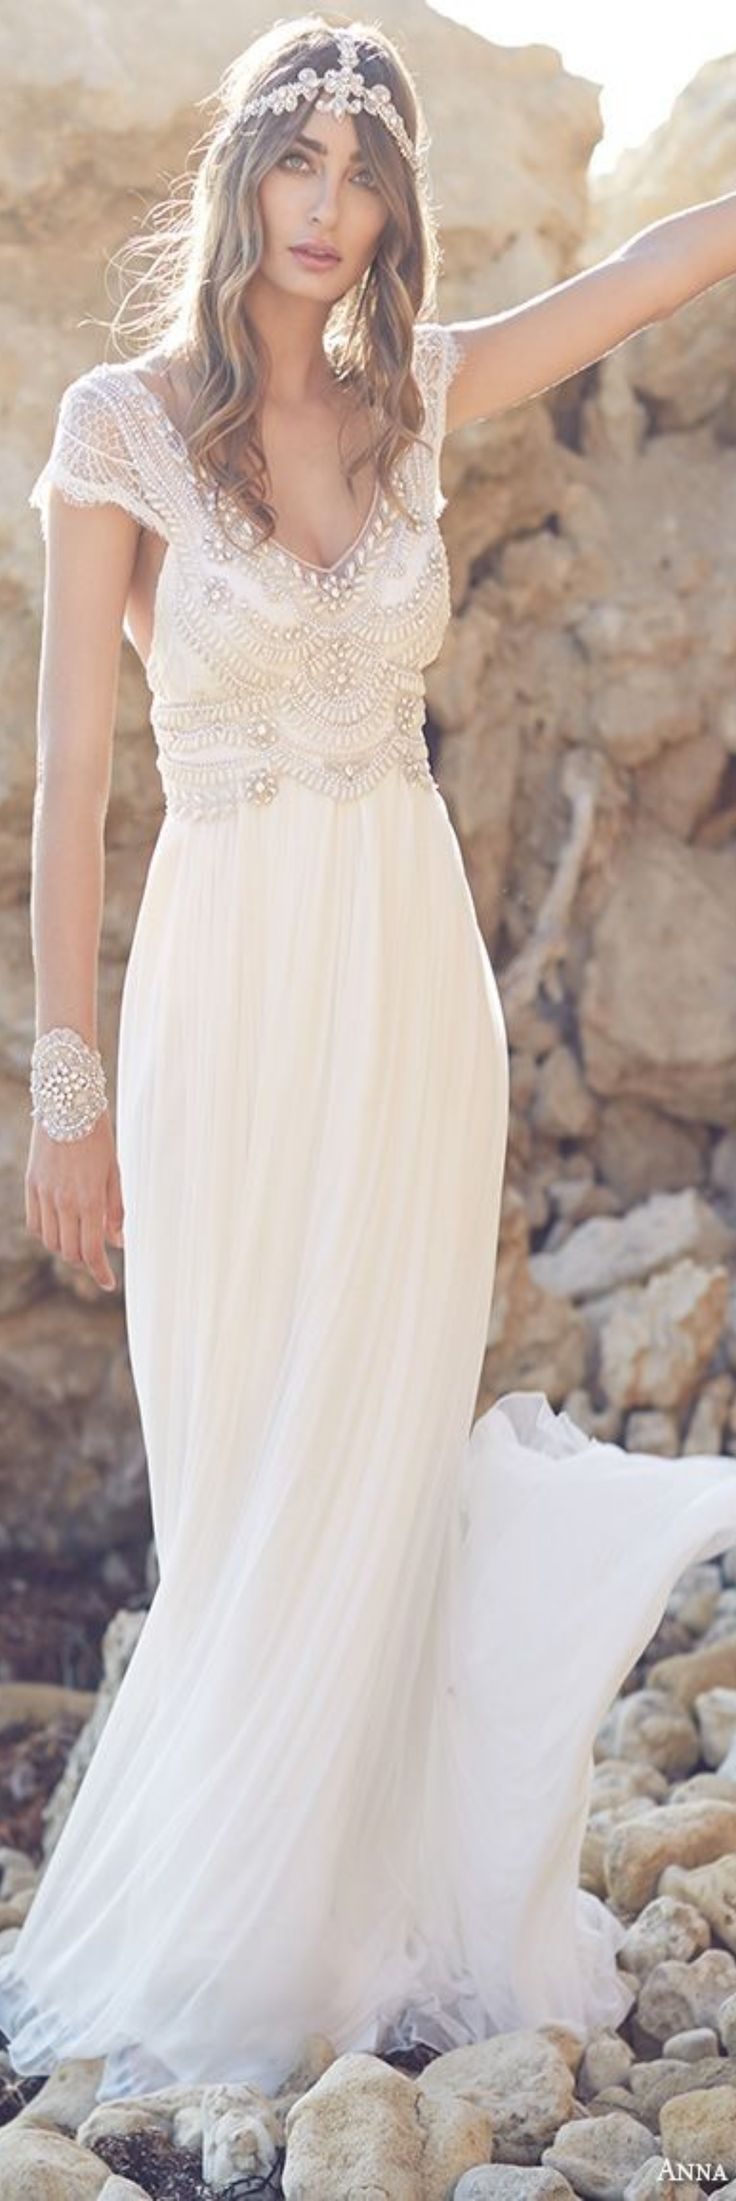 BEACH WEDDING dress boho style